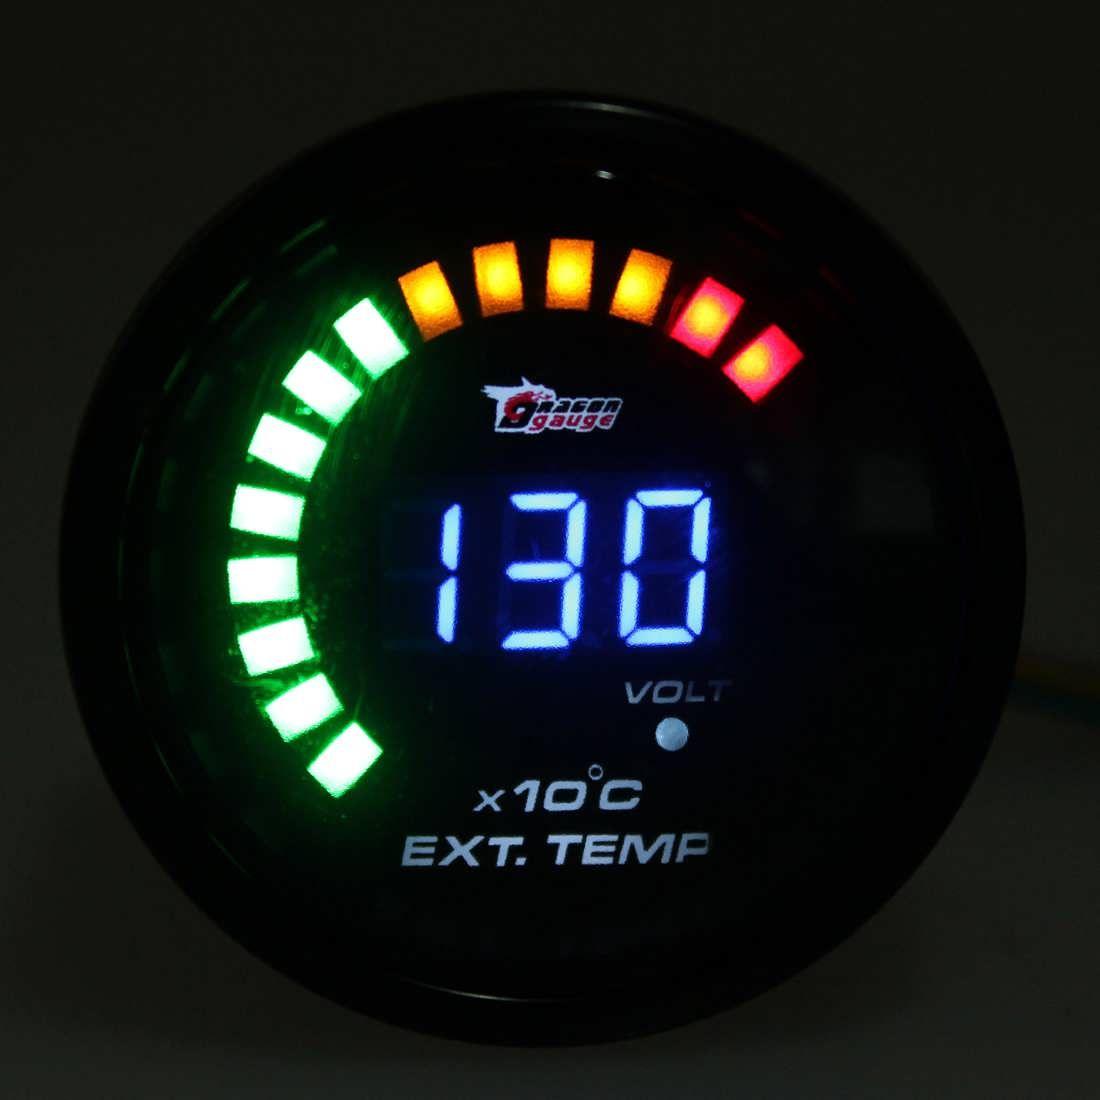 Auto car analog led digital exhaust gas temp temperature